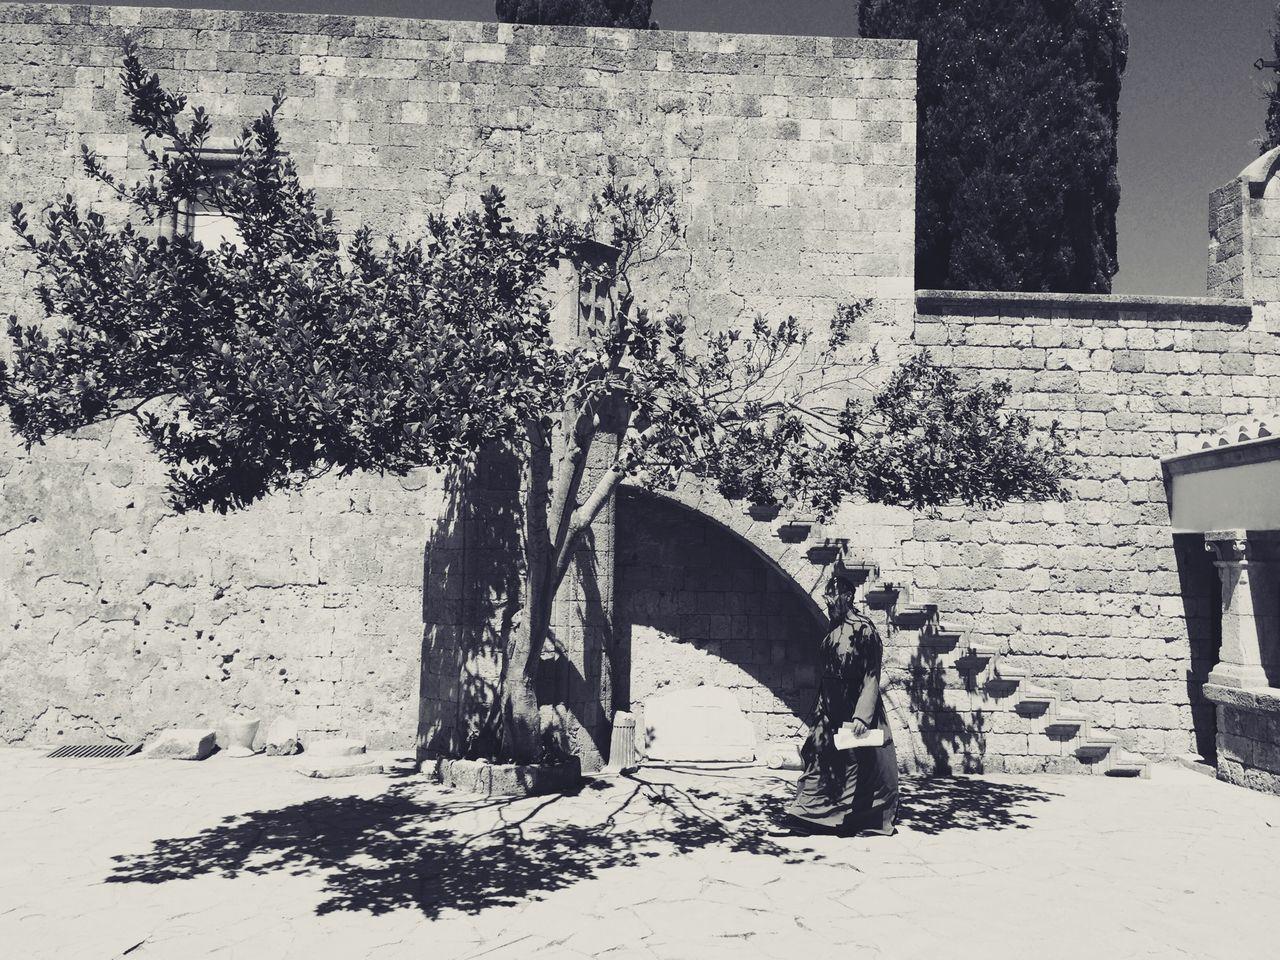 Mönch im Kloster in Ródos... Love this picture. Taking Photos Monochrome Picoftheday Theportraitist